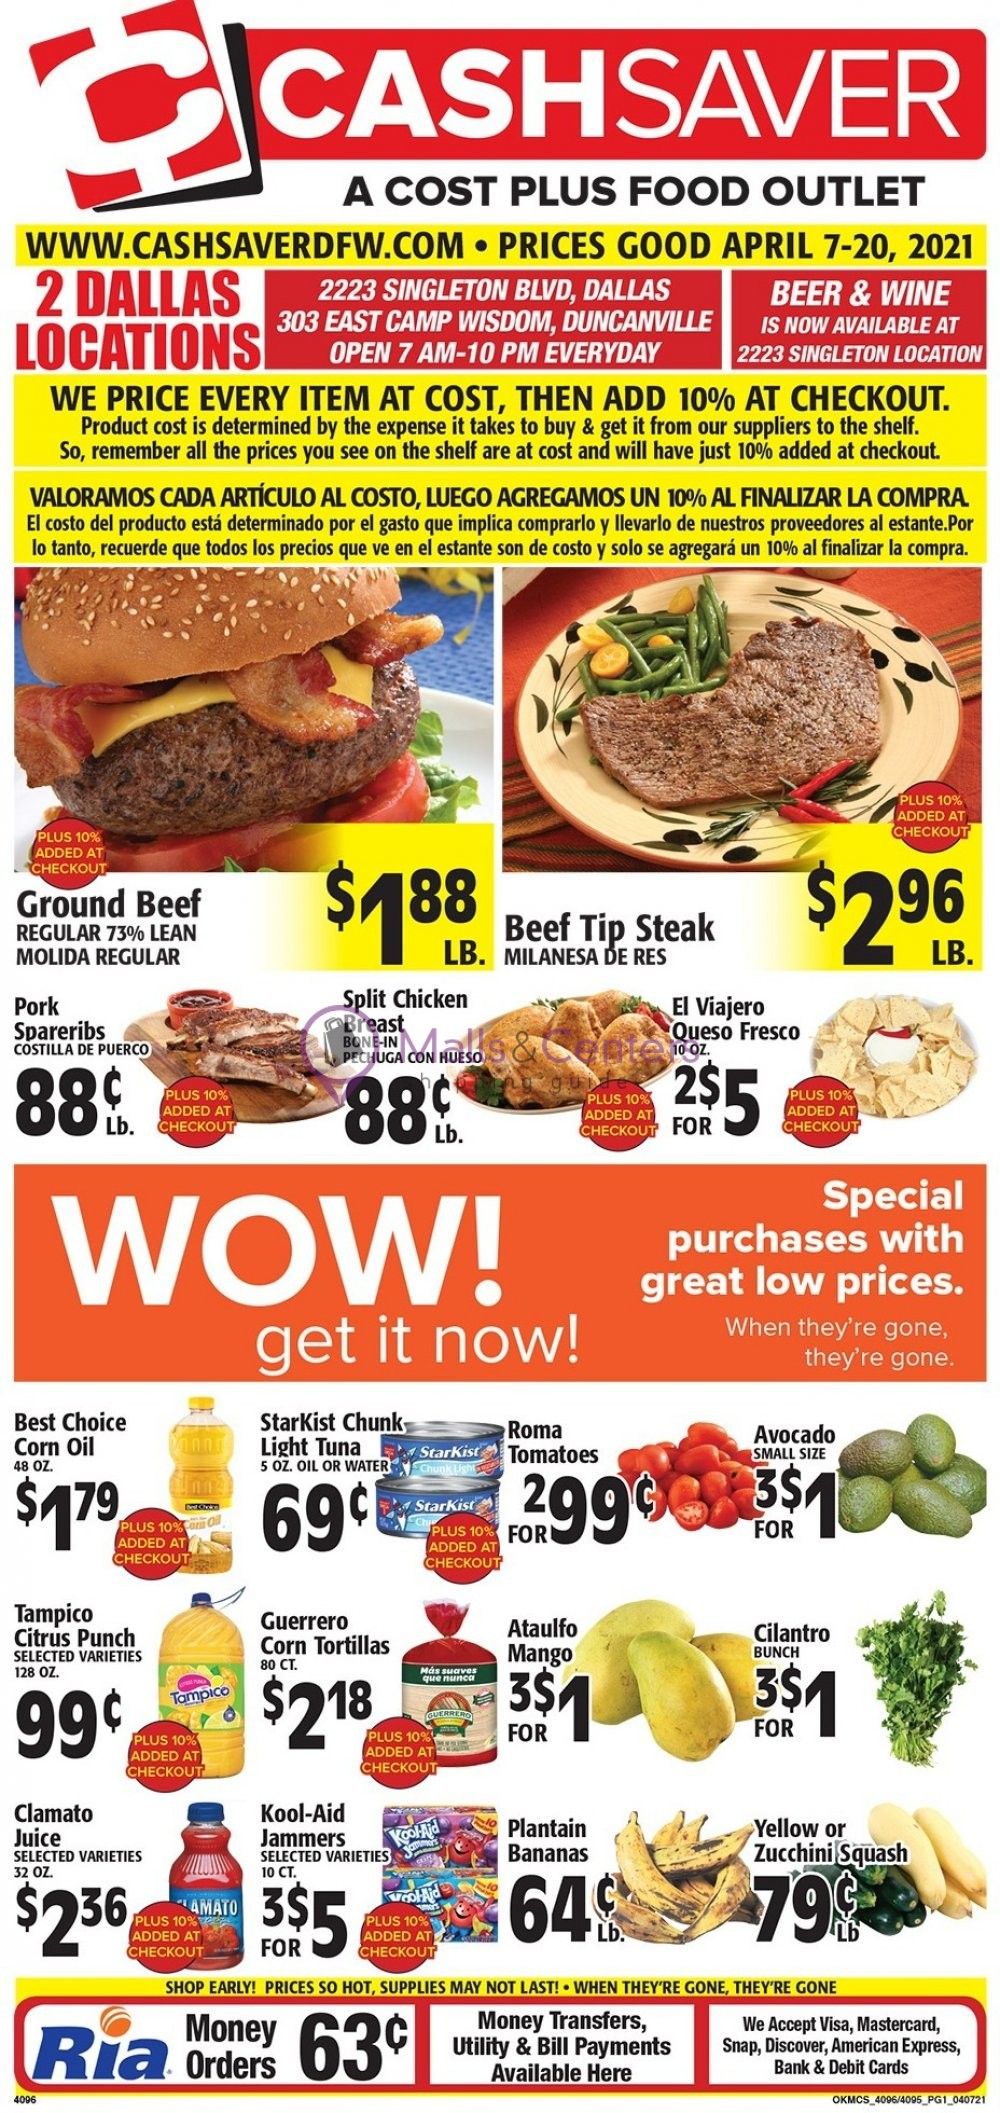 weekly ads DFW Cash Saver - page 1 - mallscenters.com